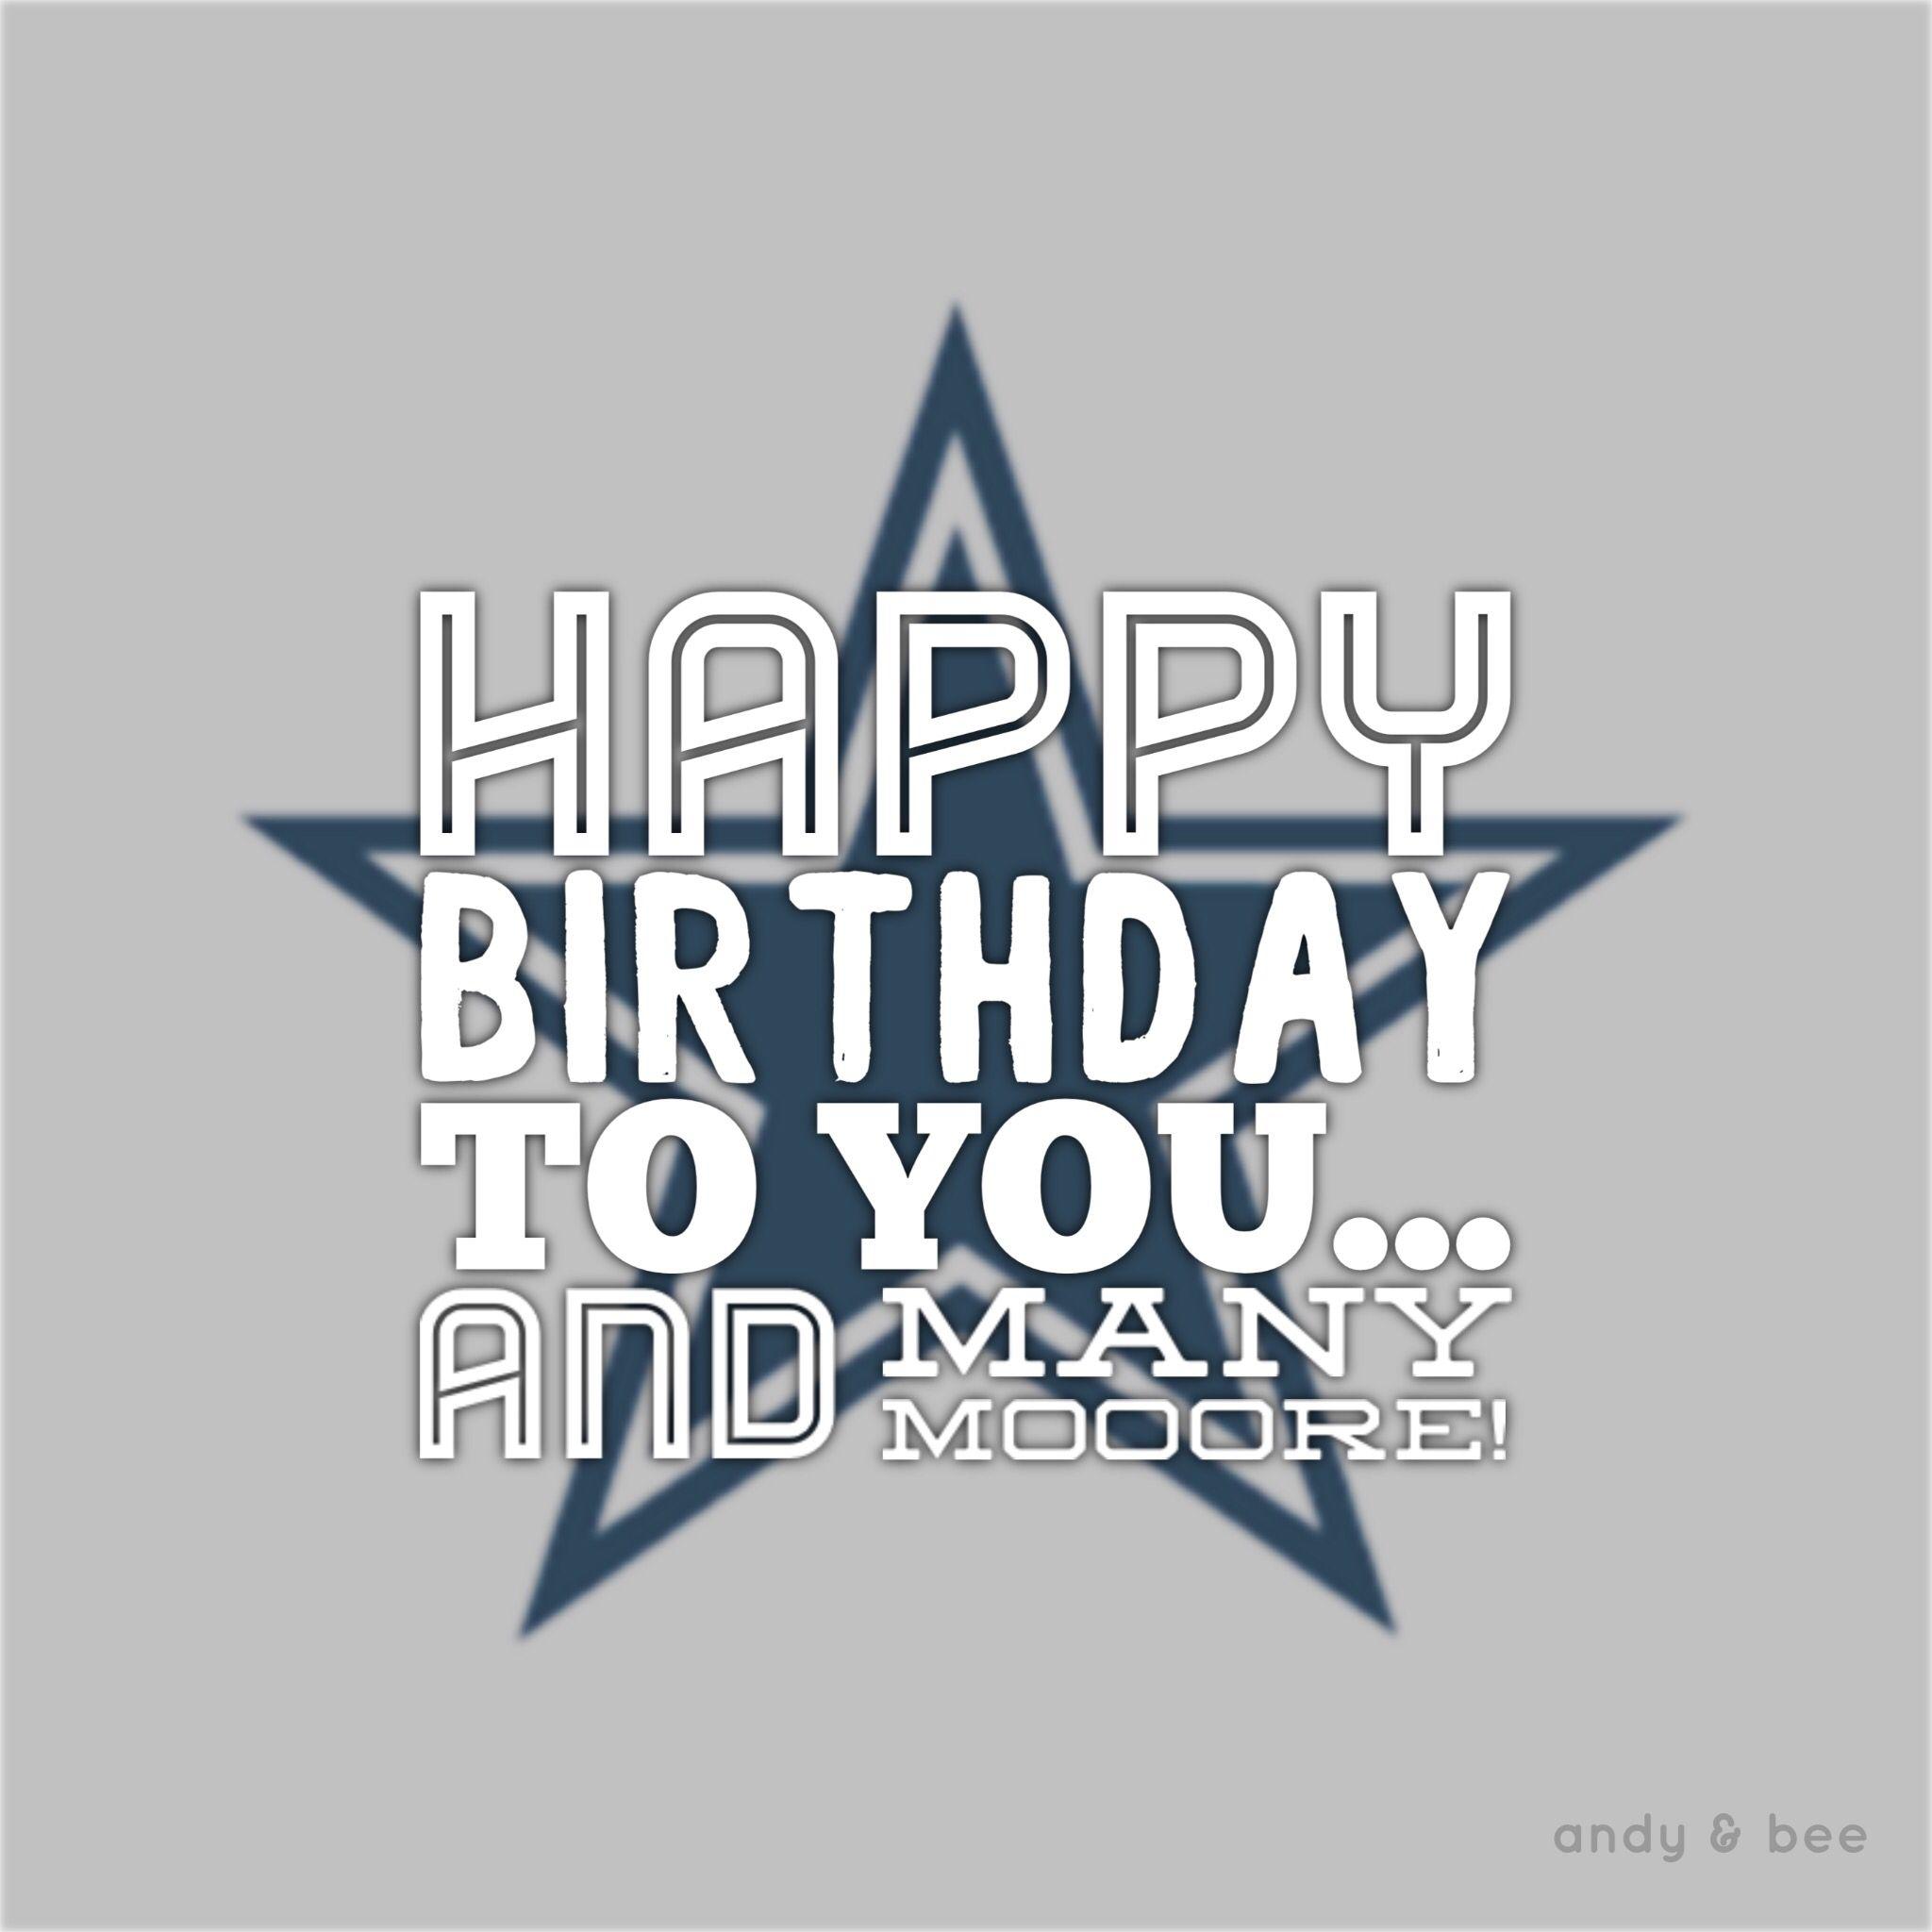 Dallas cowboys birthday card alas i left the watermark there dallas cowboys birthday card alas i left the watermark kristyandbryce Choice Image